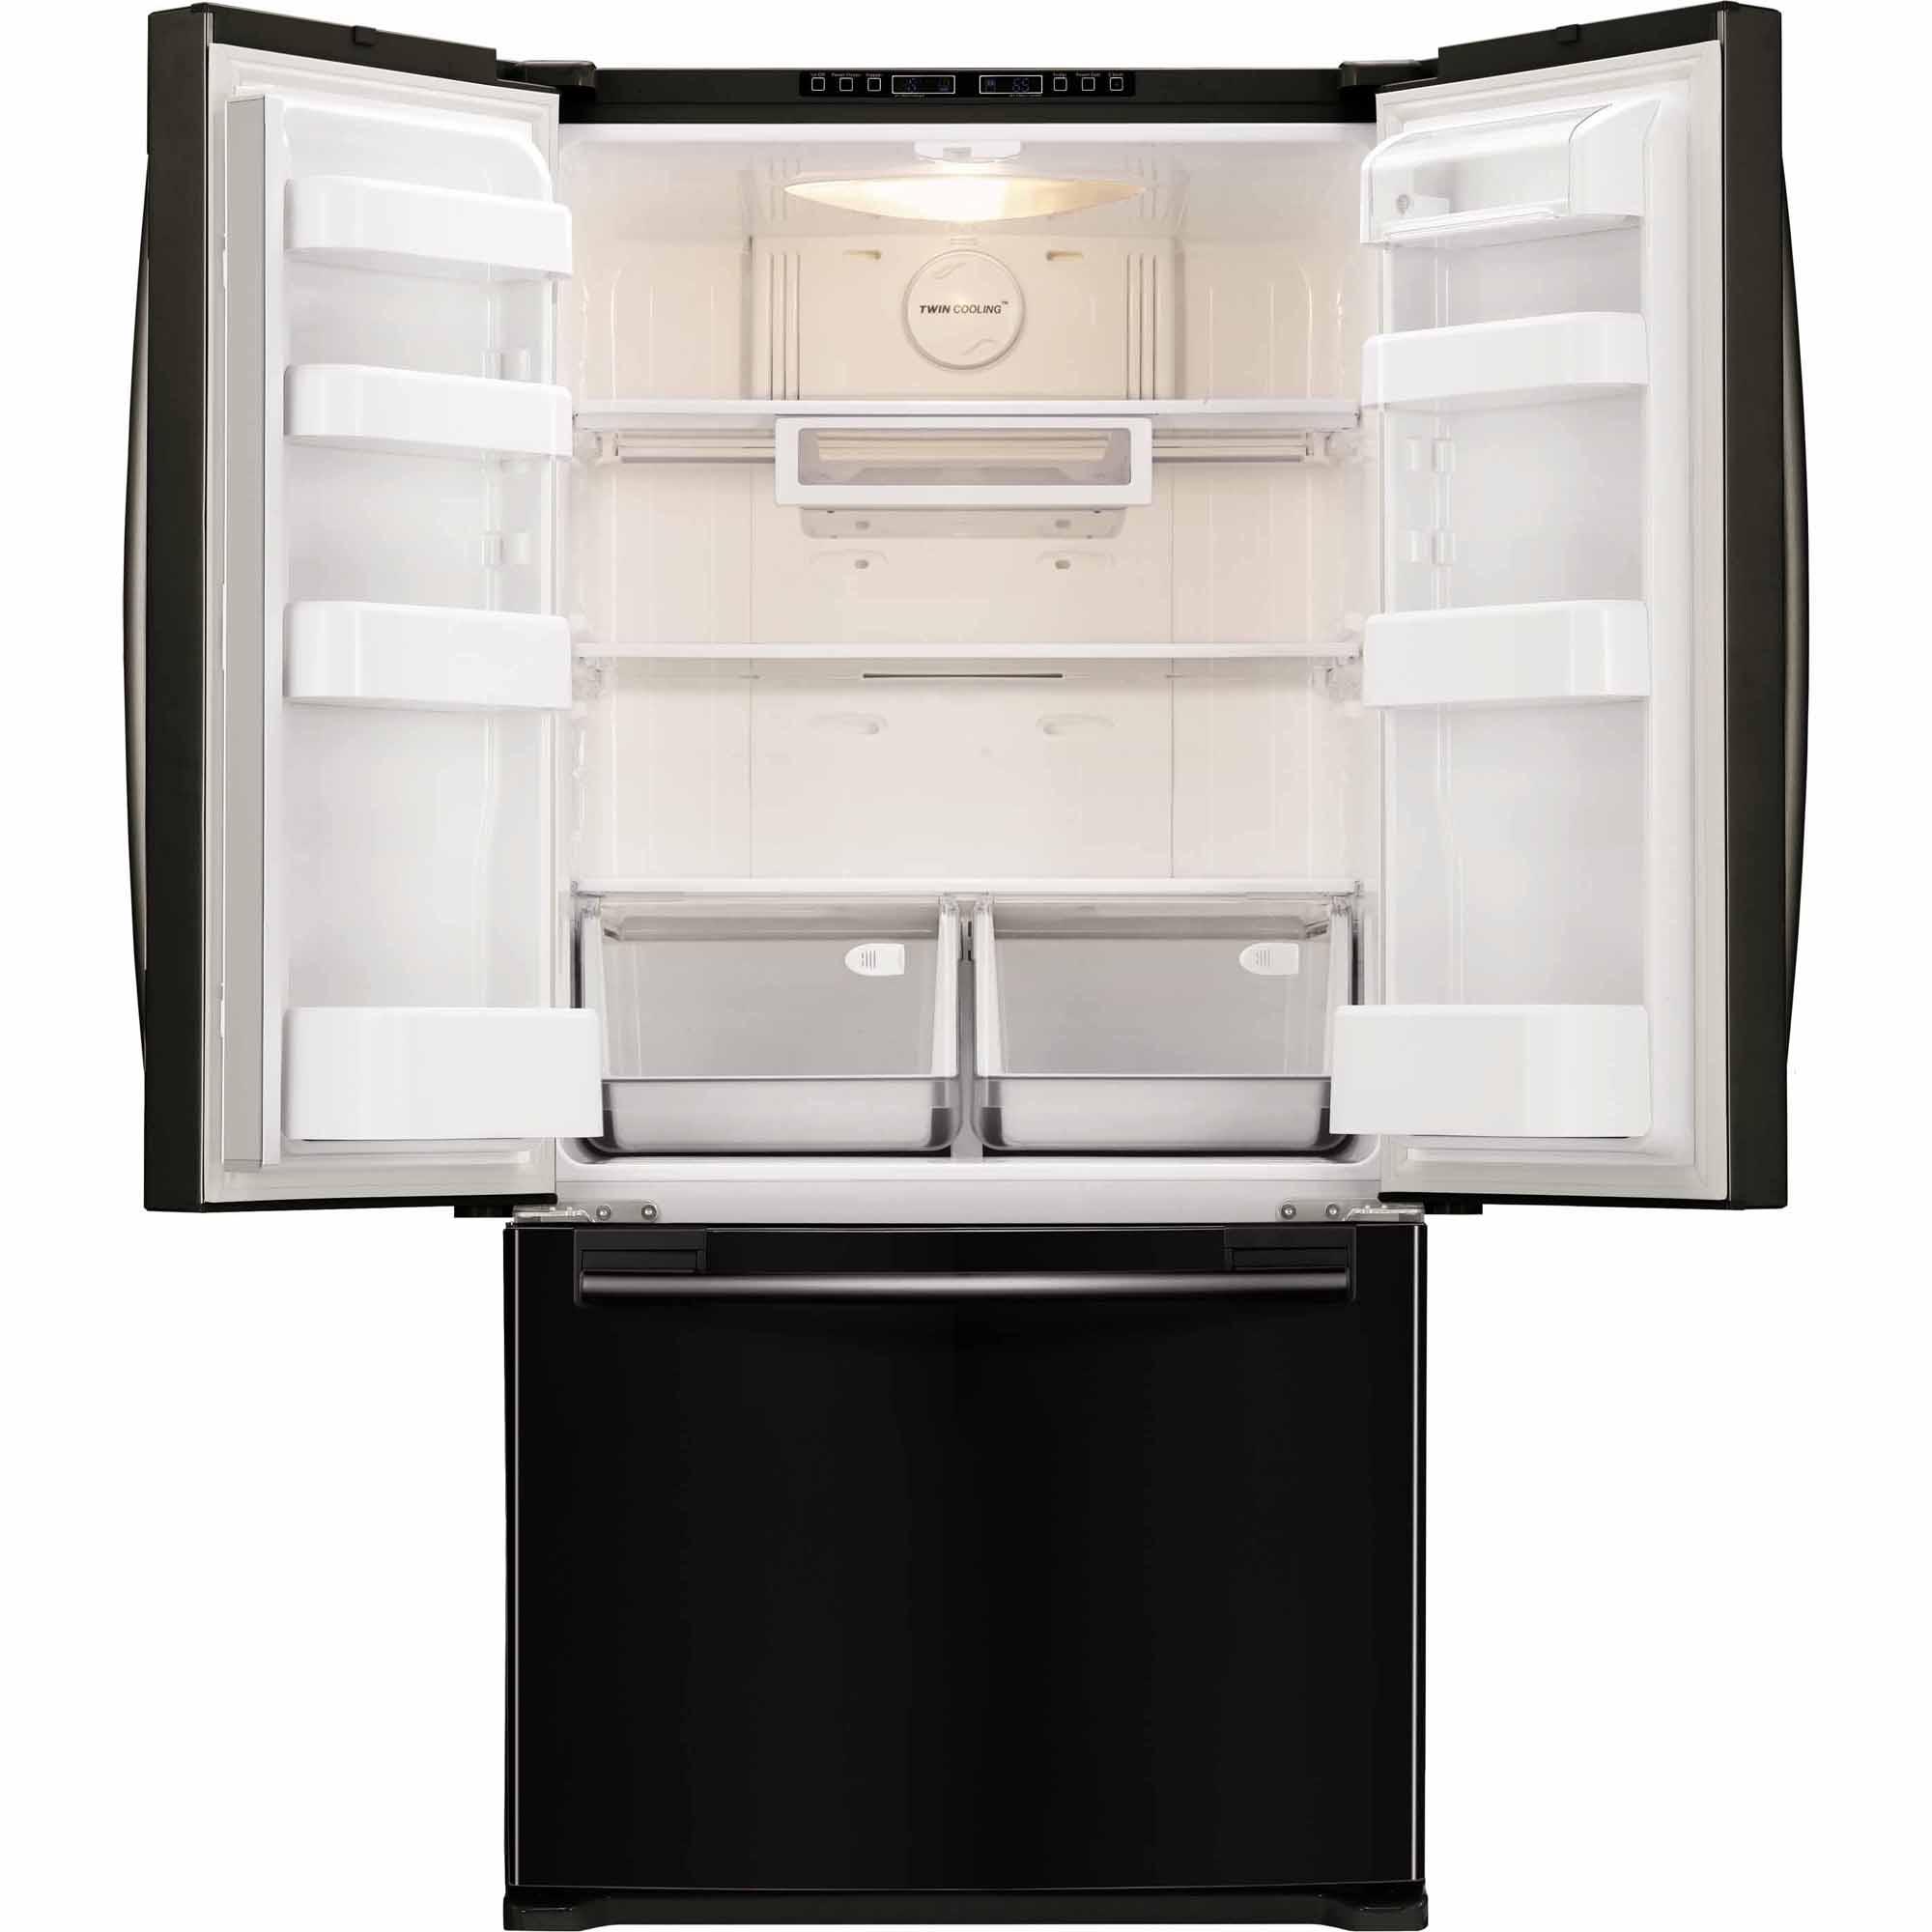 Samsung 18 cu. ft. Capacity Counter-Depth French Door Refrigerator - Black